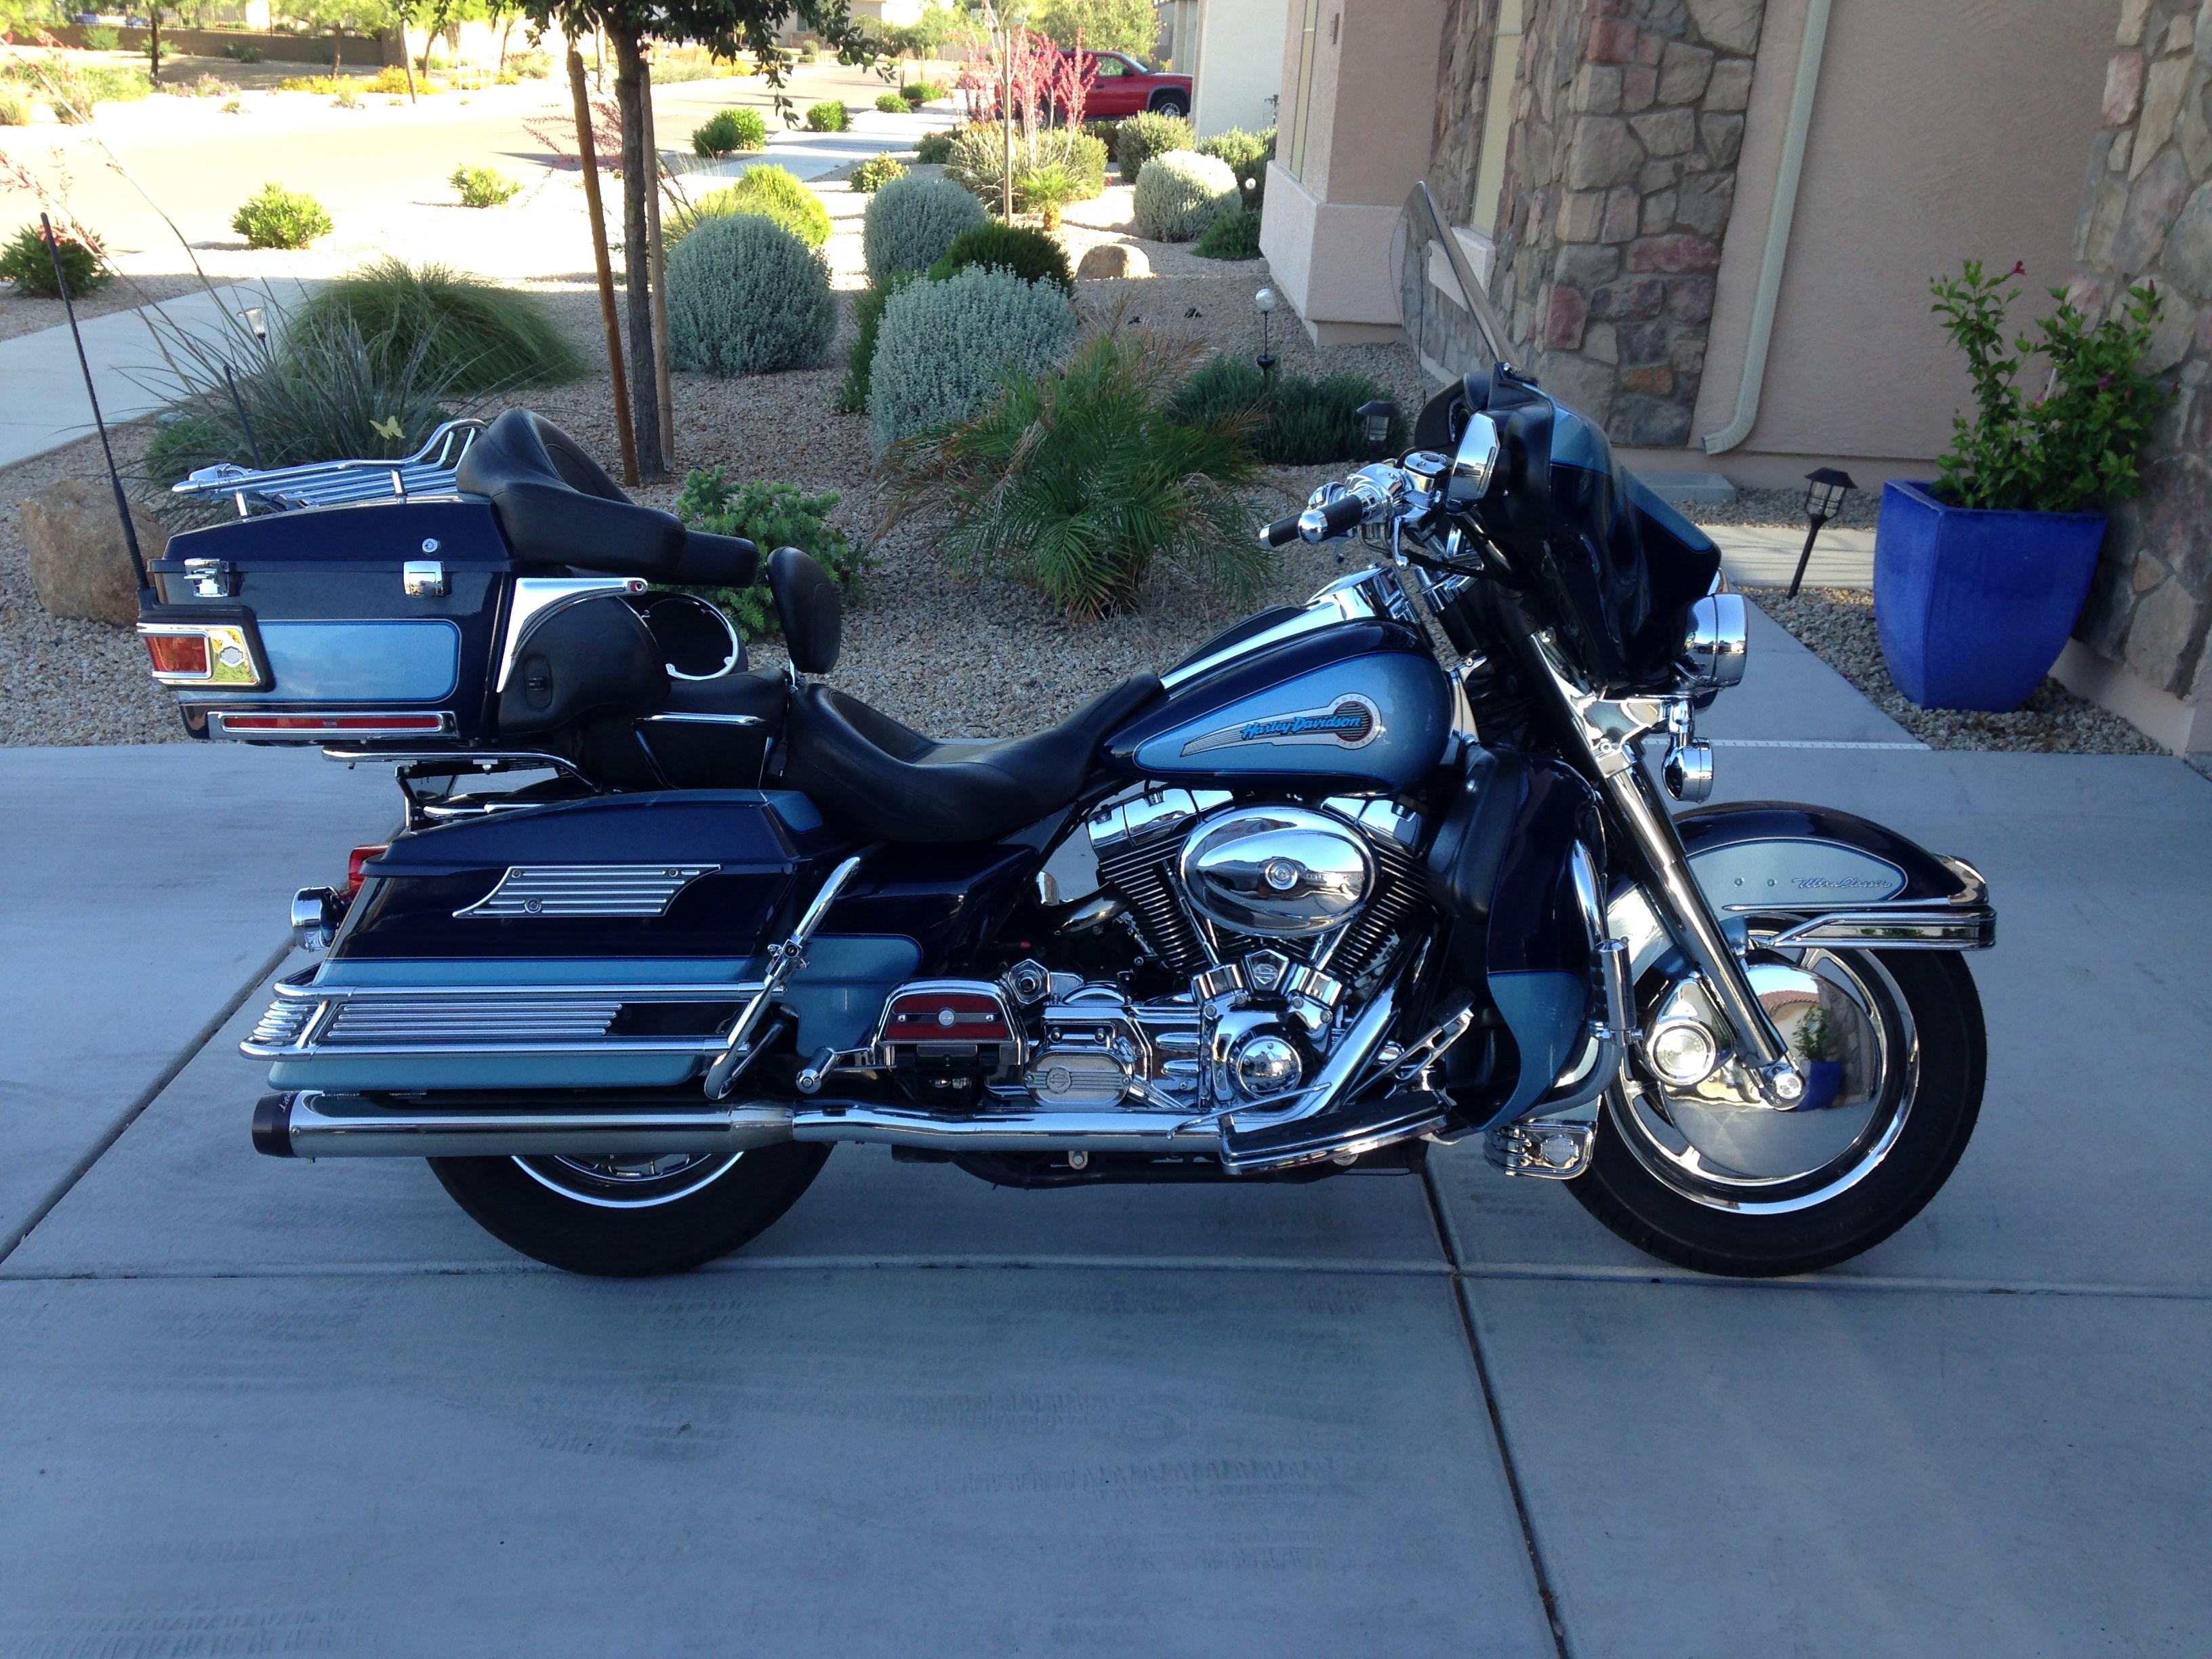 2004 Harley-Davidson® FLHTCU/I Ultra Clic® Electra Glide® Firefighter/Peace on harley fatboy diagram, harley knucklehead diagram, harley sportster diagram,